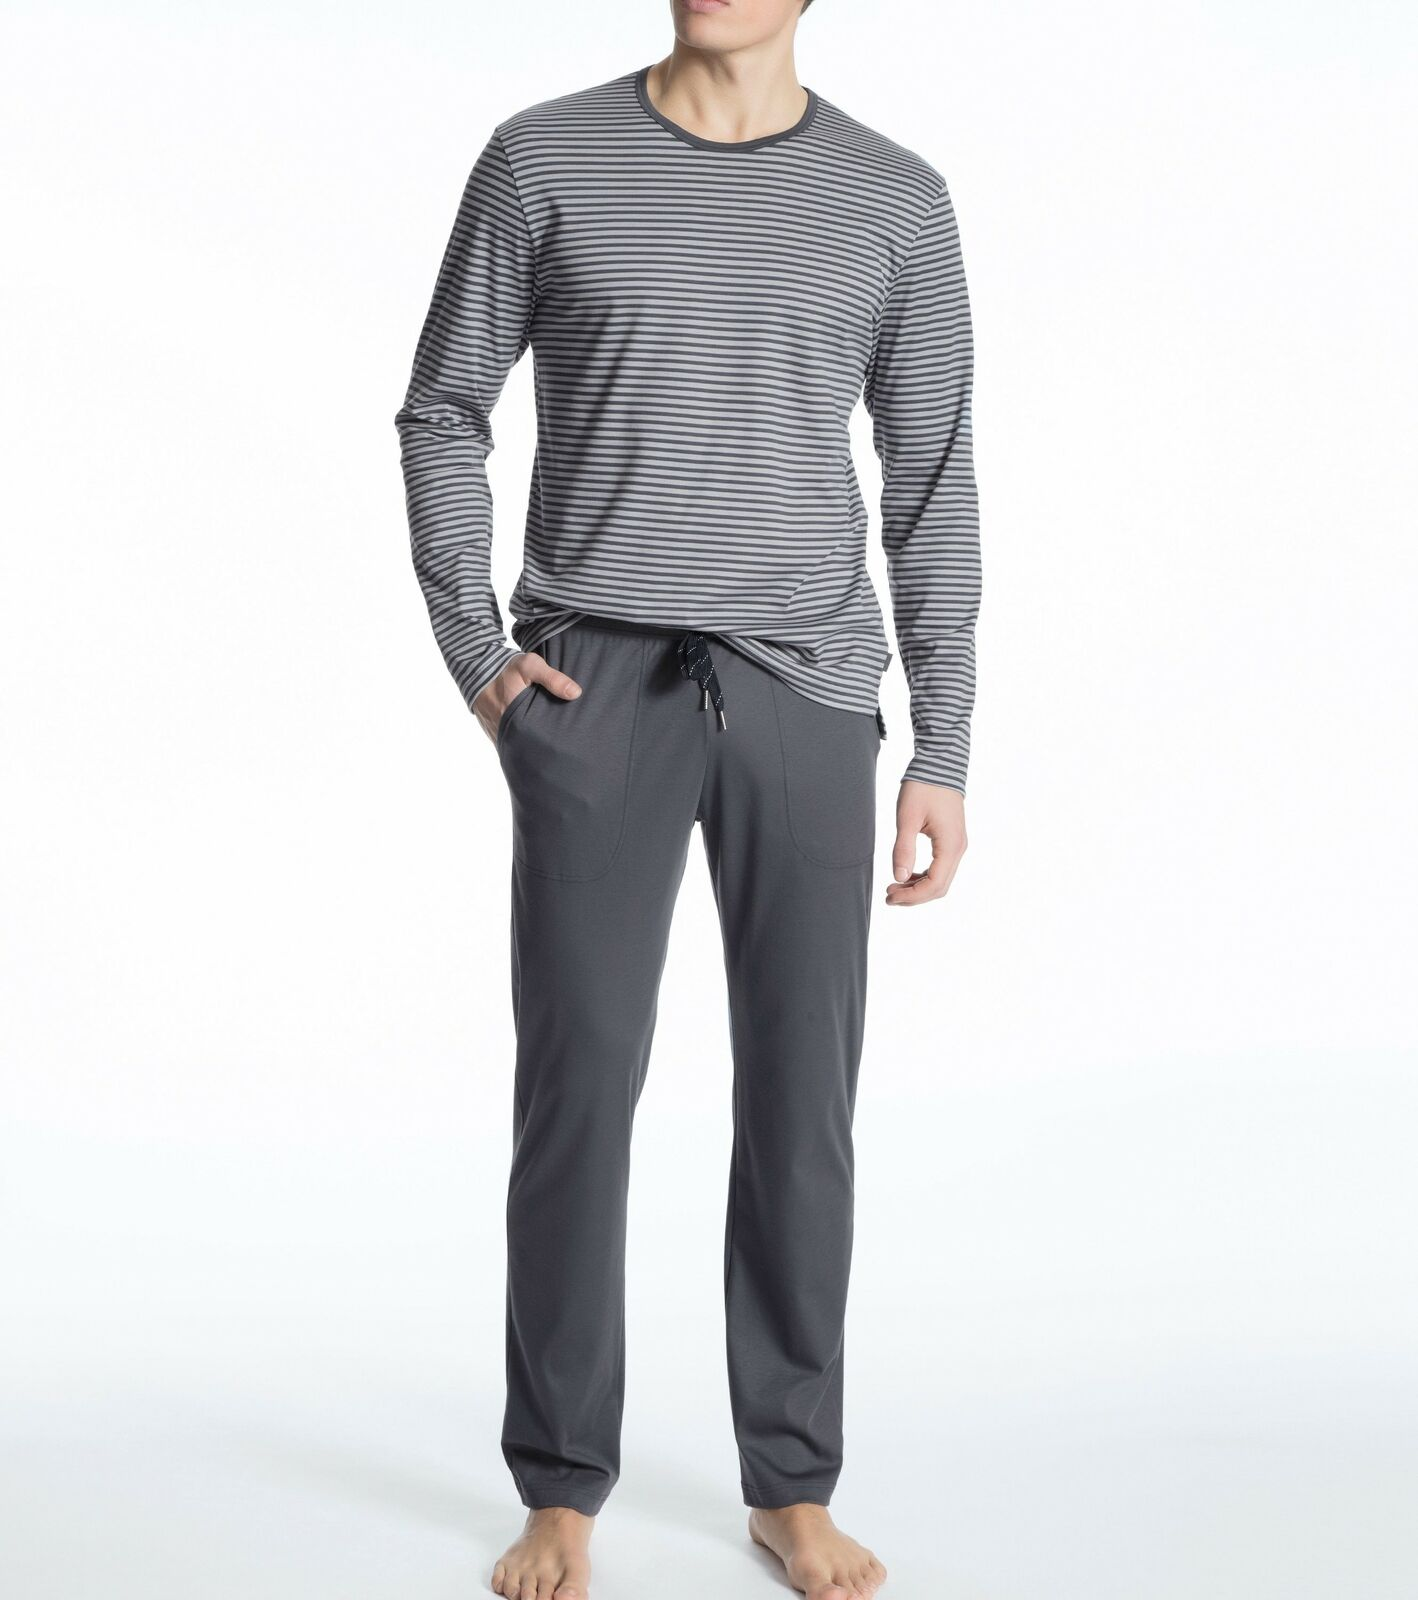 Calida Herren Pyjama Schlafanzug lang ohne Bündchen Art. 49768 100% Baumwolle